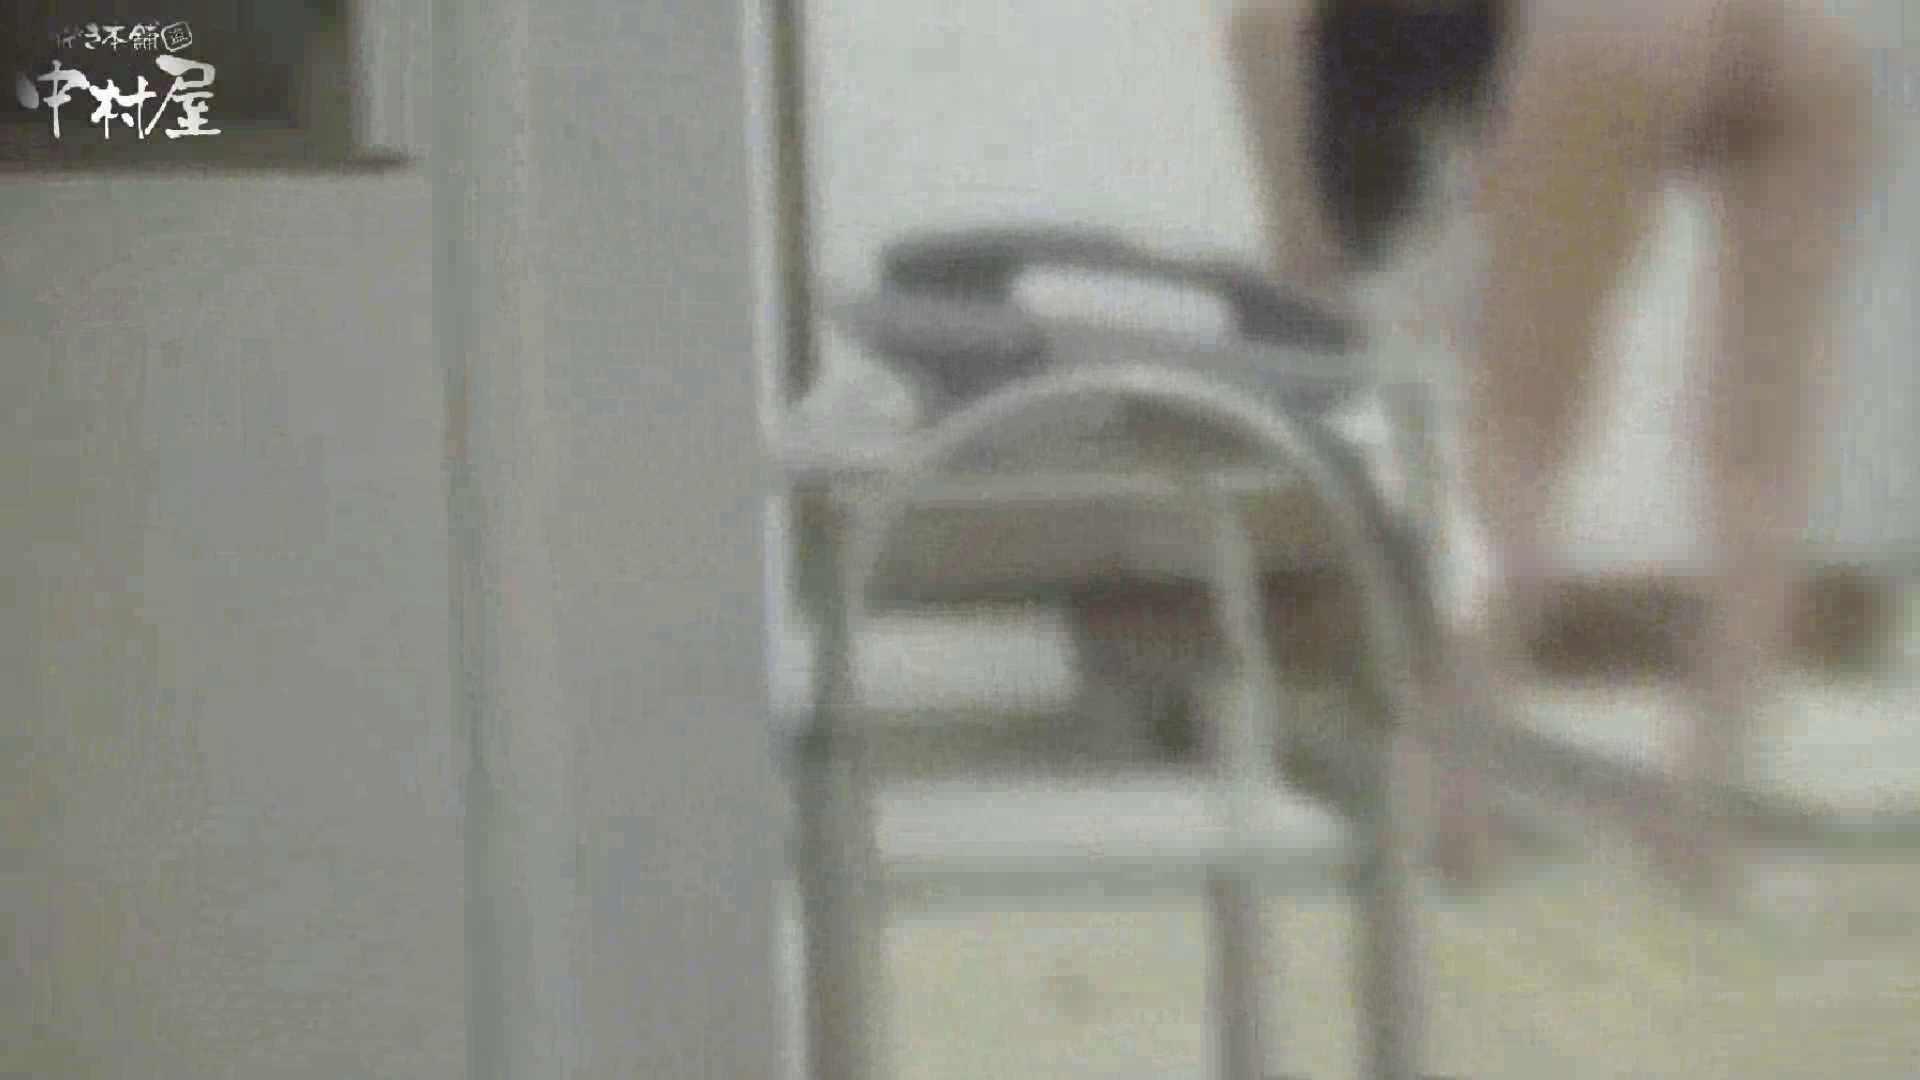 民家風呂専門盗撮師の超危険映像 vol.009 盗撮大放出 われめAV動画紹介 67連発 67